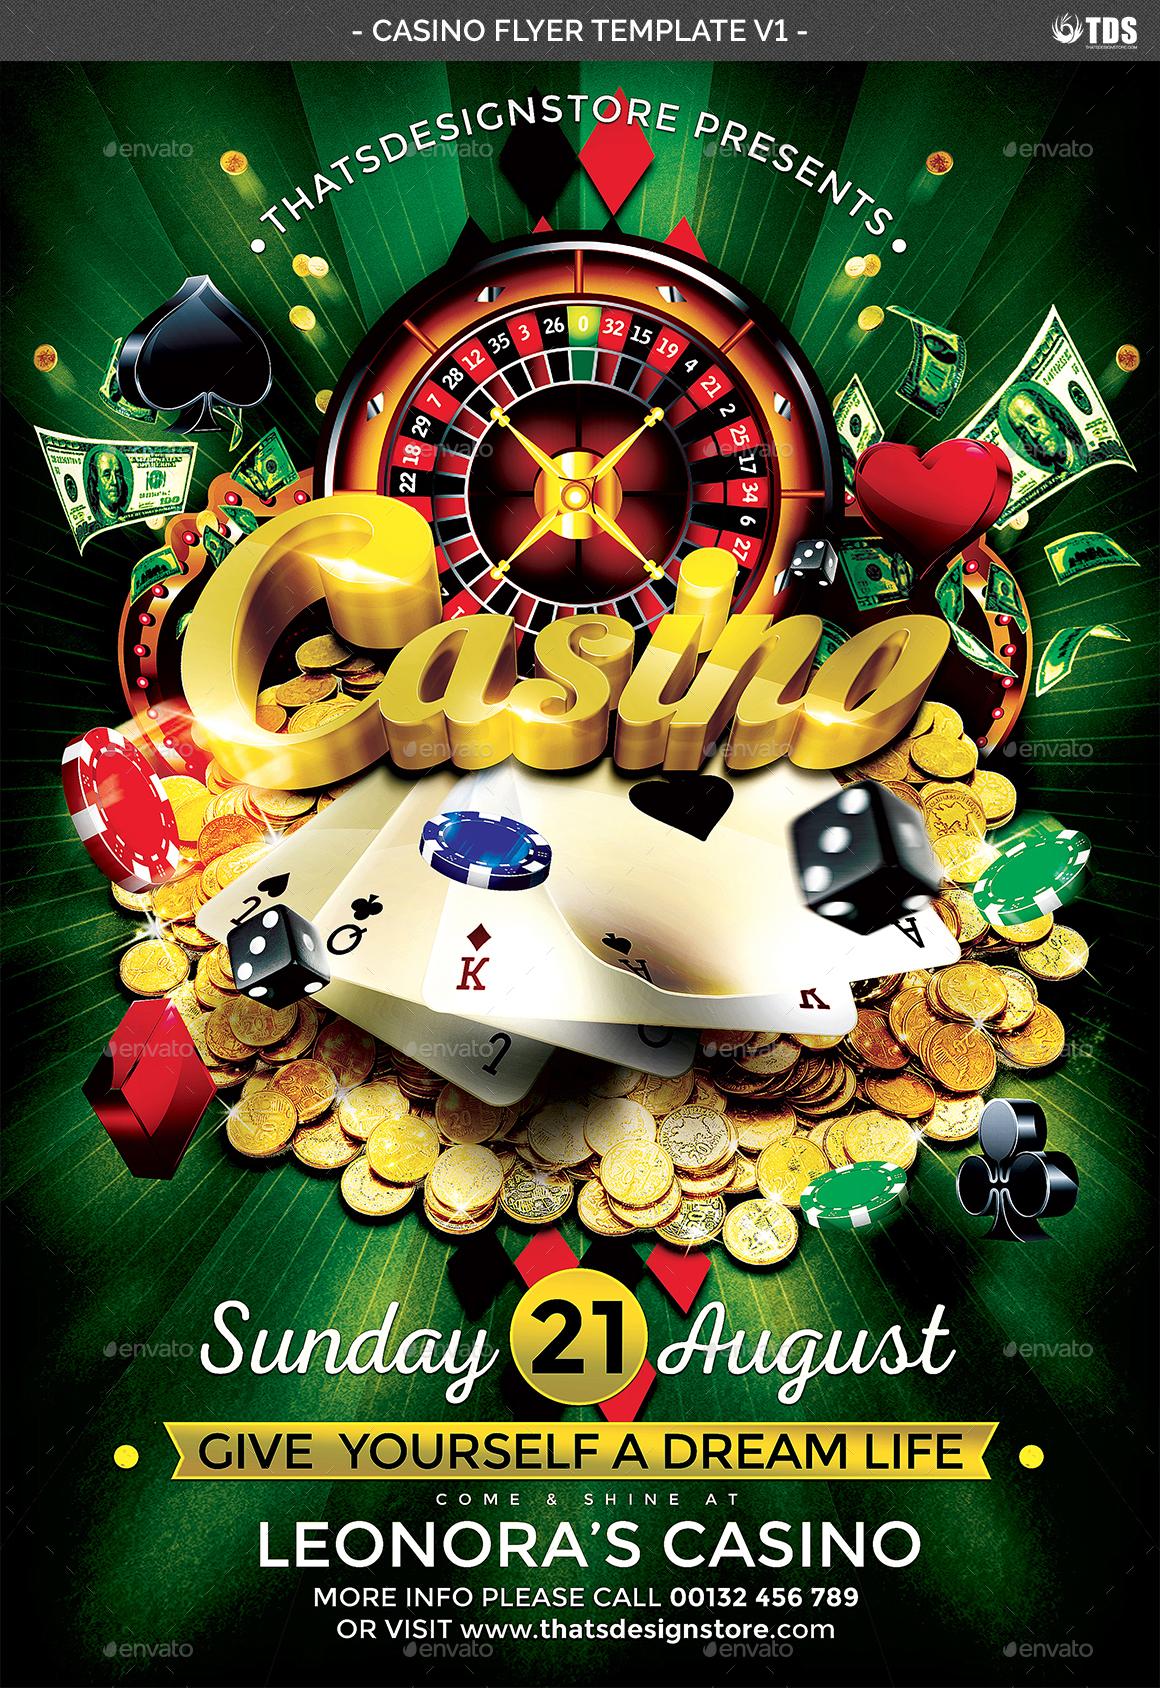 casino flyer template v1 by lou606